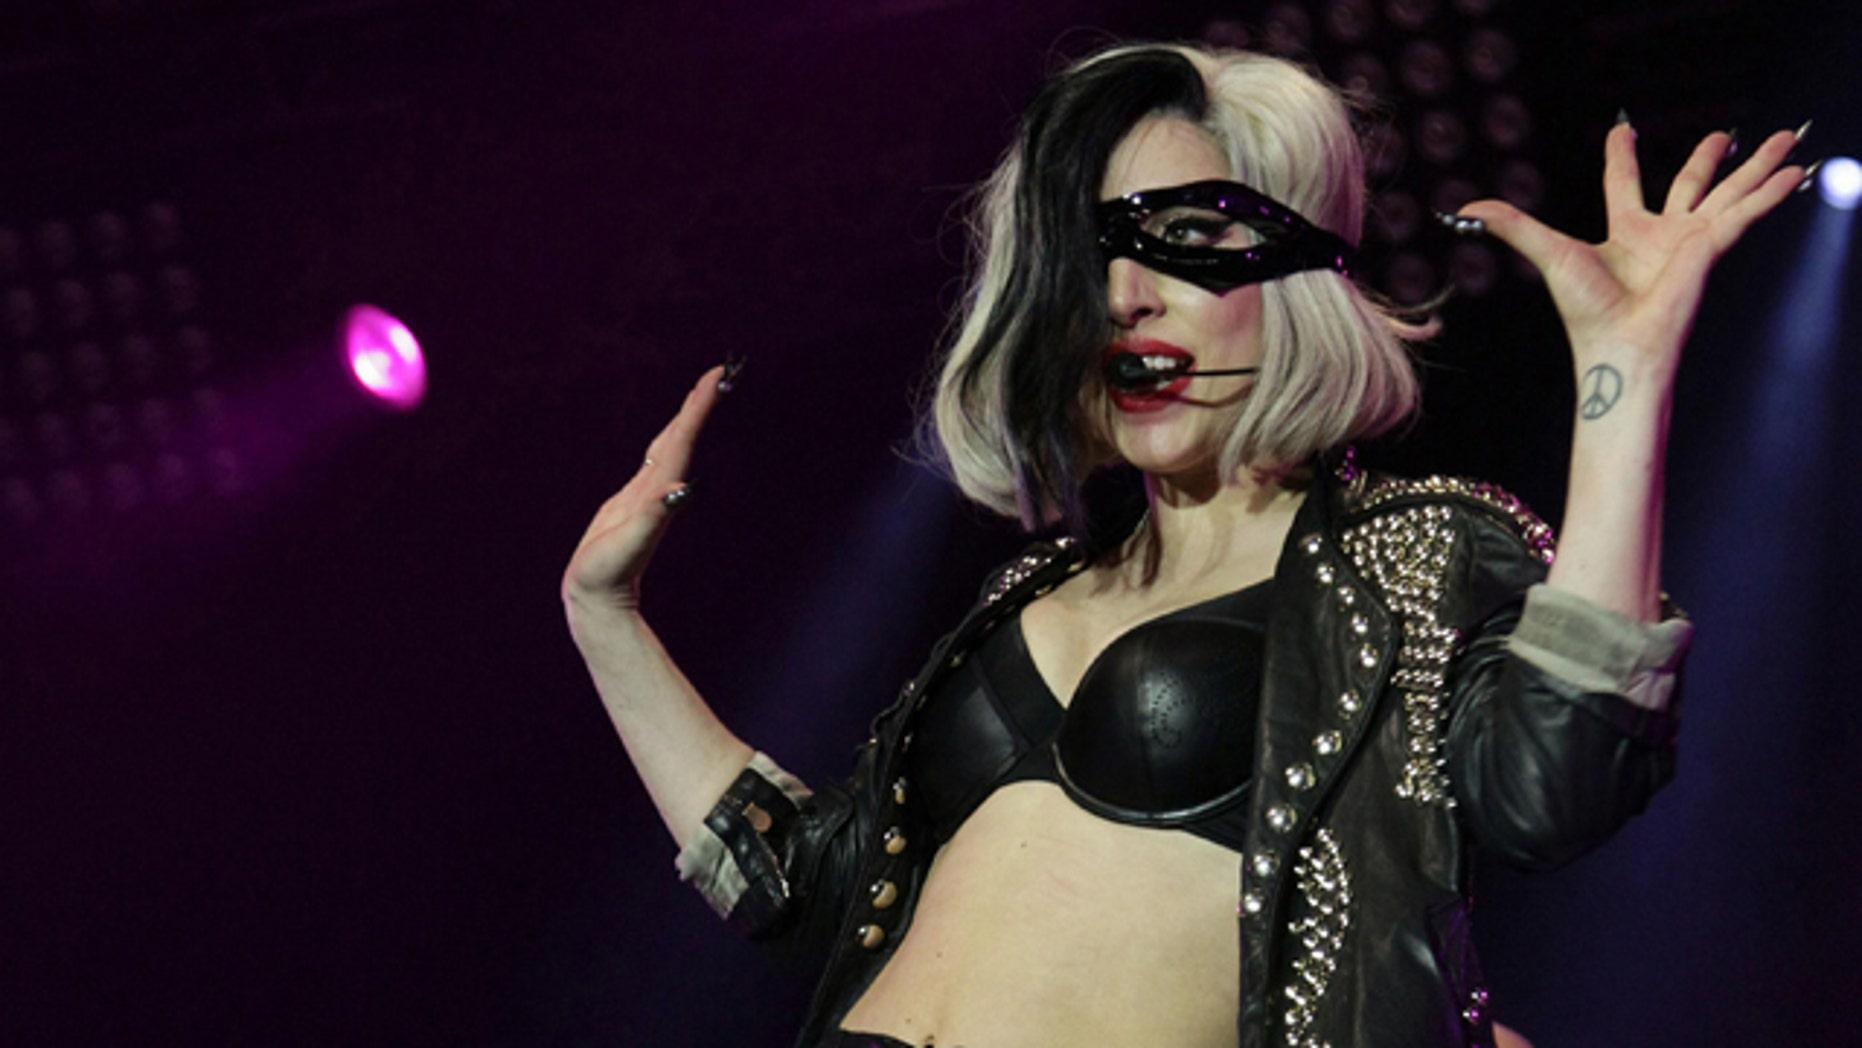 May 15: Lady Gaga performs on the Main Stage at BBC Radio 1's Big Weekend, held at Carlisle Airport, Britain.